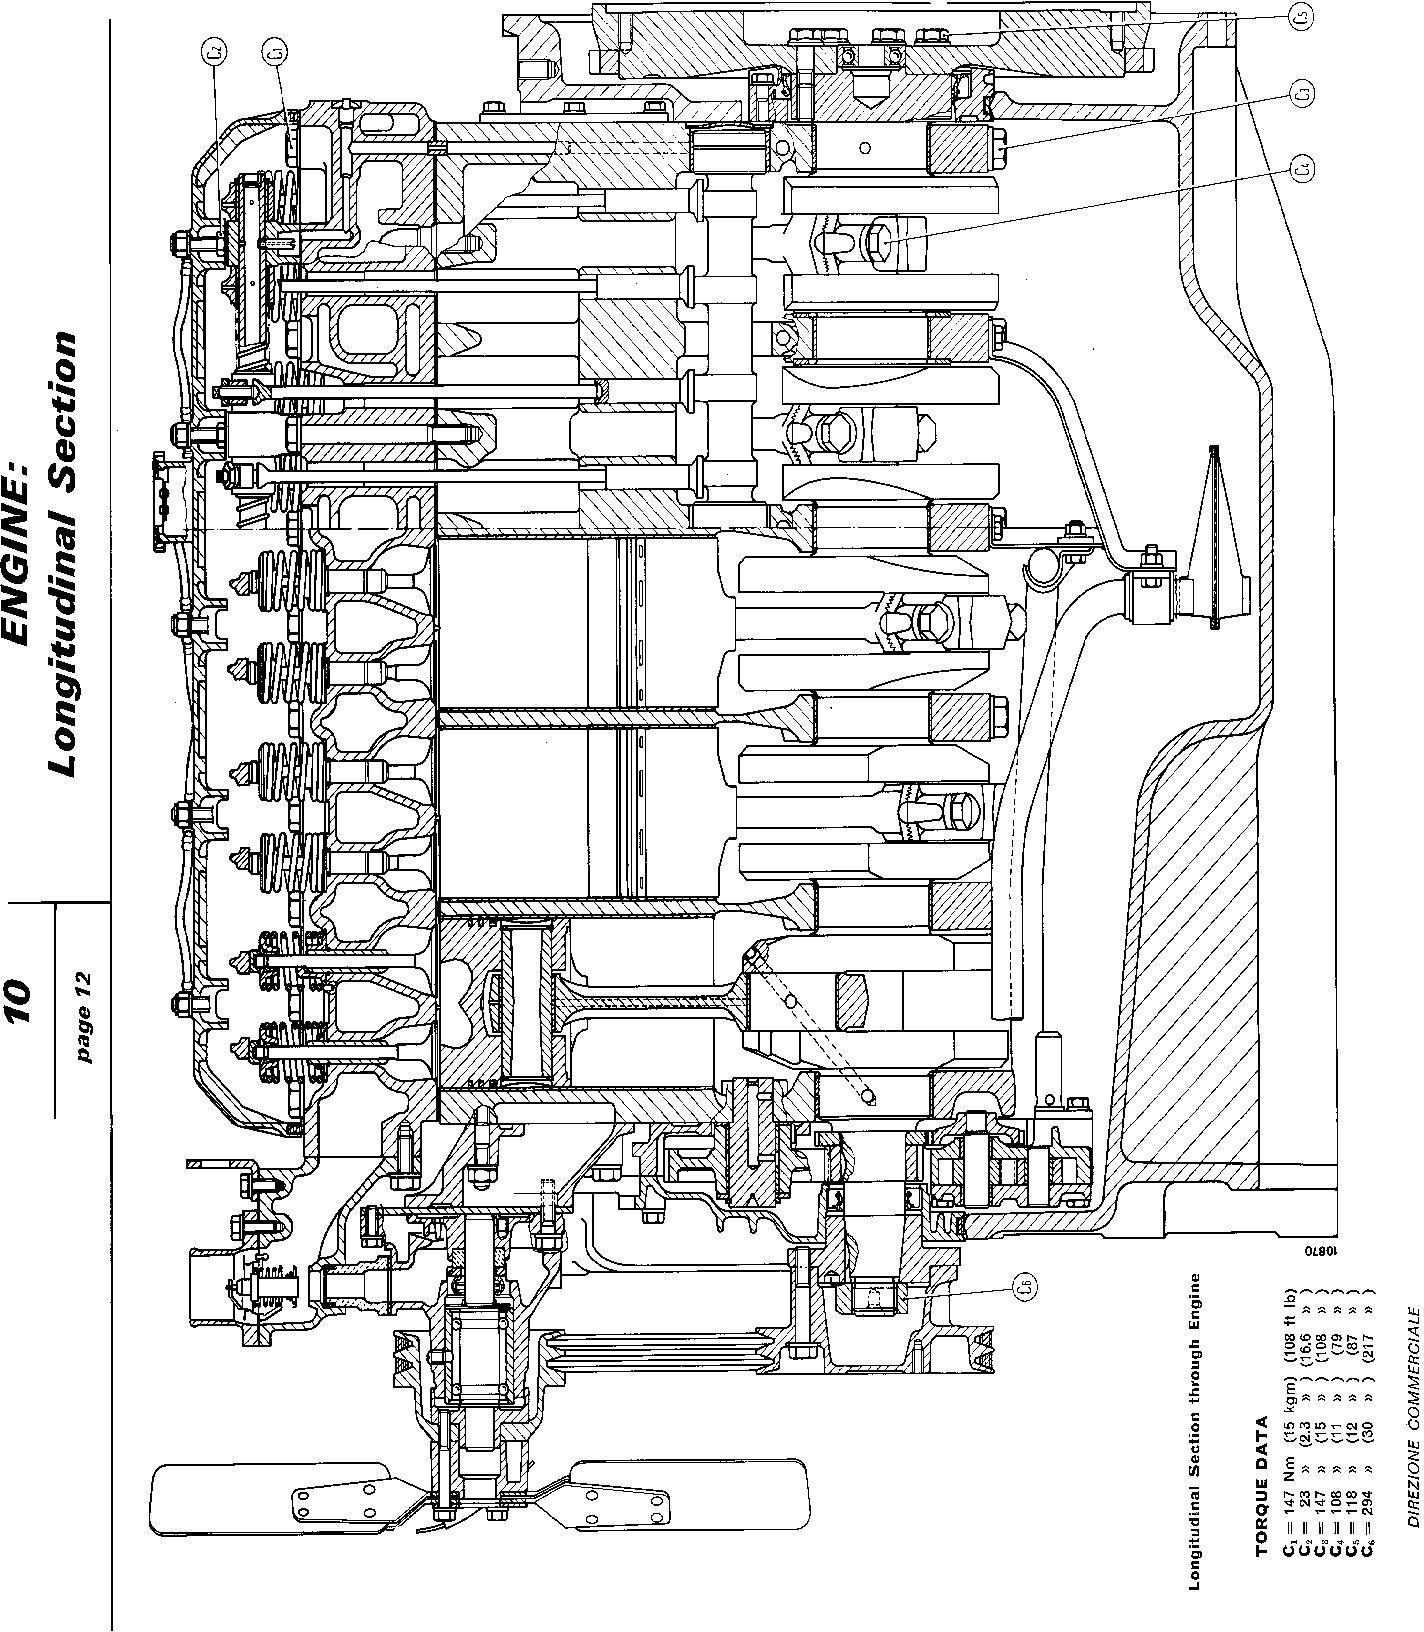 Fiat 780, 780DT, 880, 880DT, 980, 980DT Tractor Service